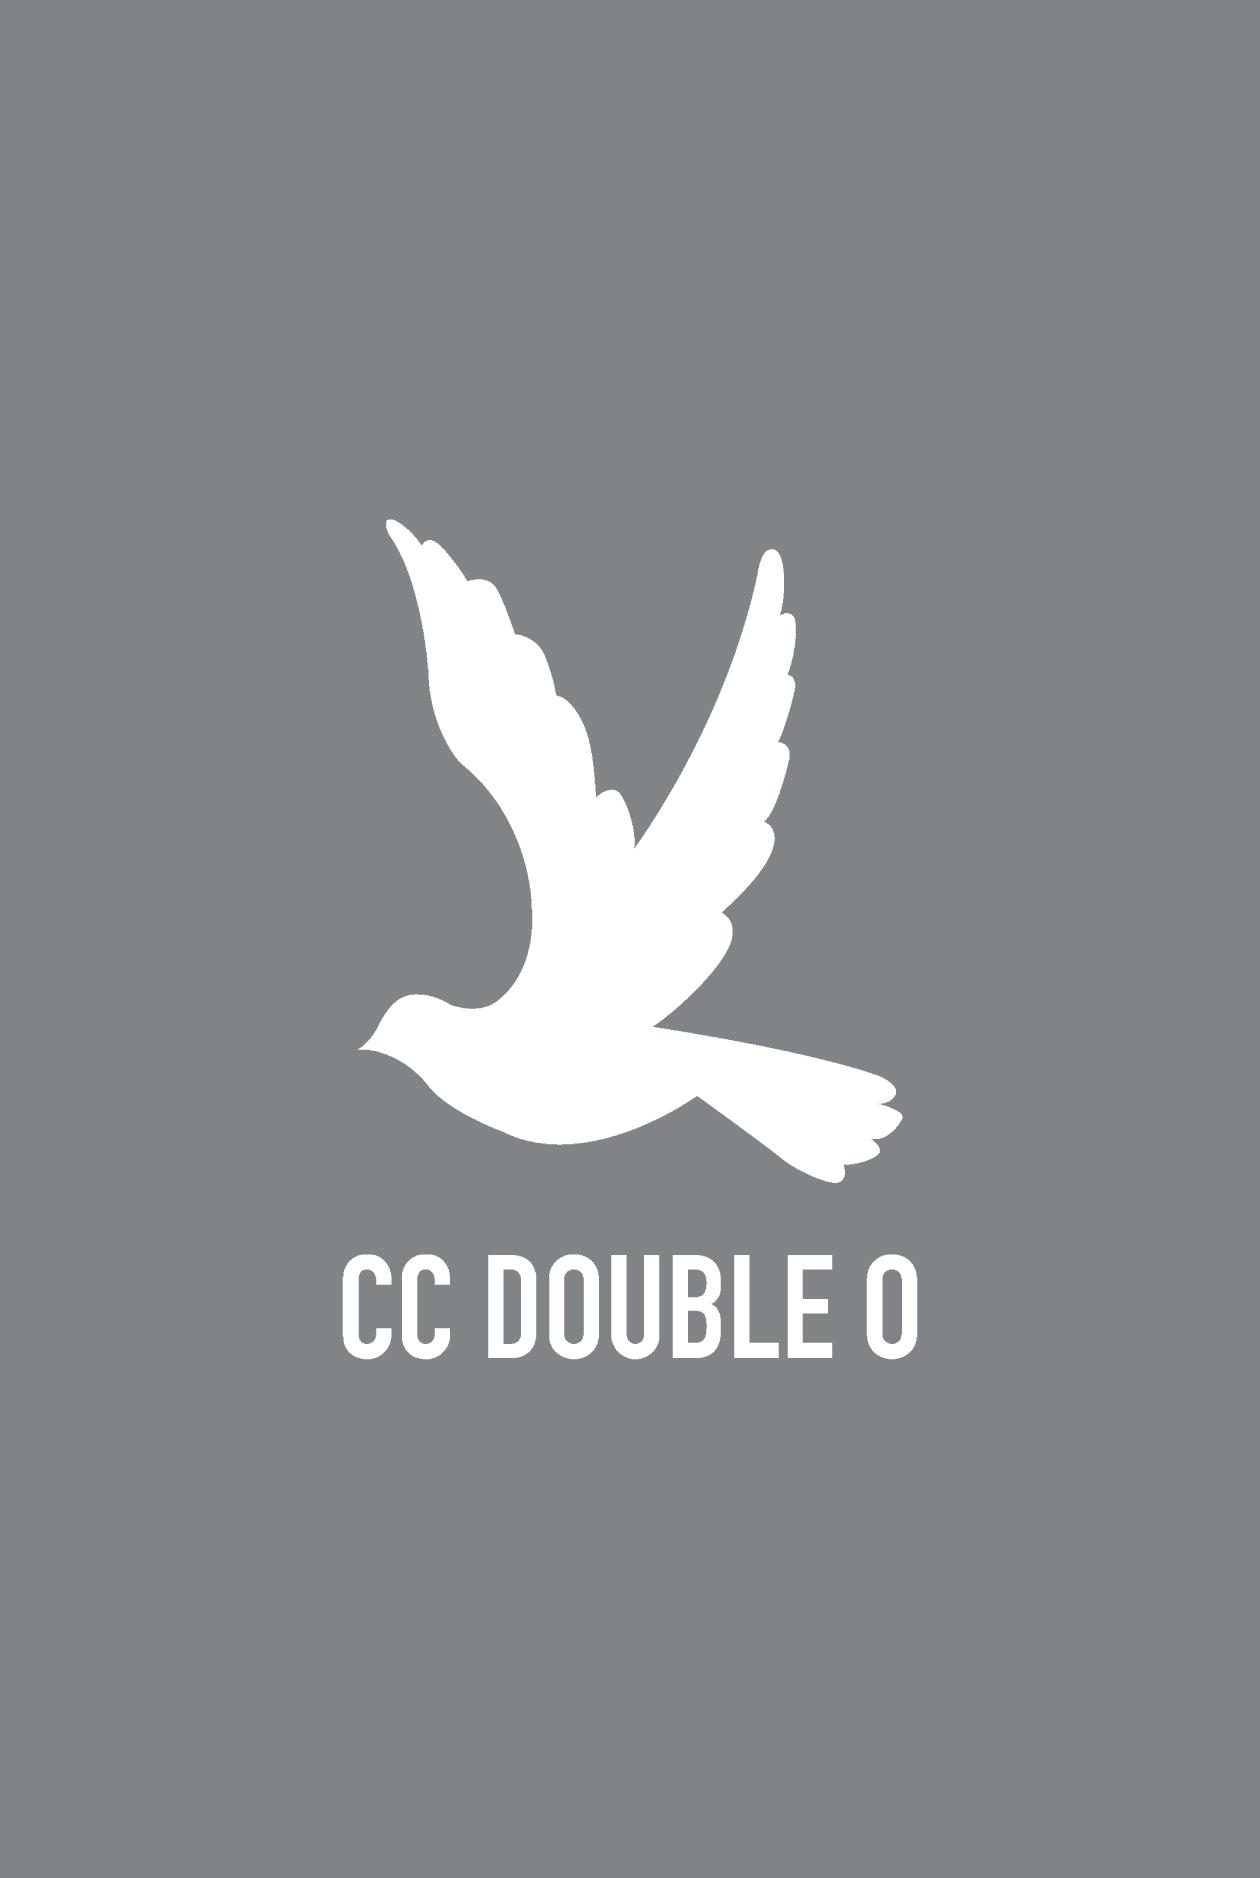 Long-Sleeved Longline shirt with CC DOUBLE O Logo Belt